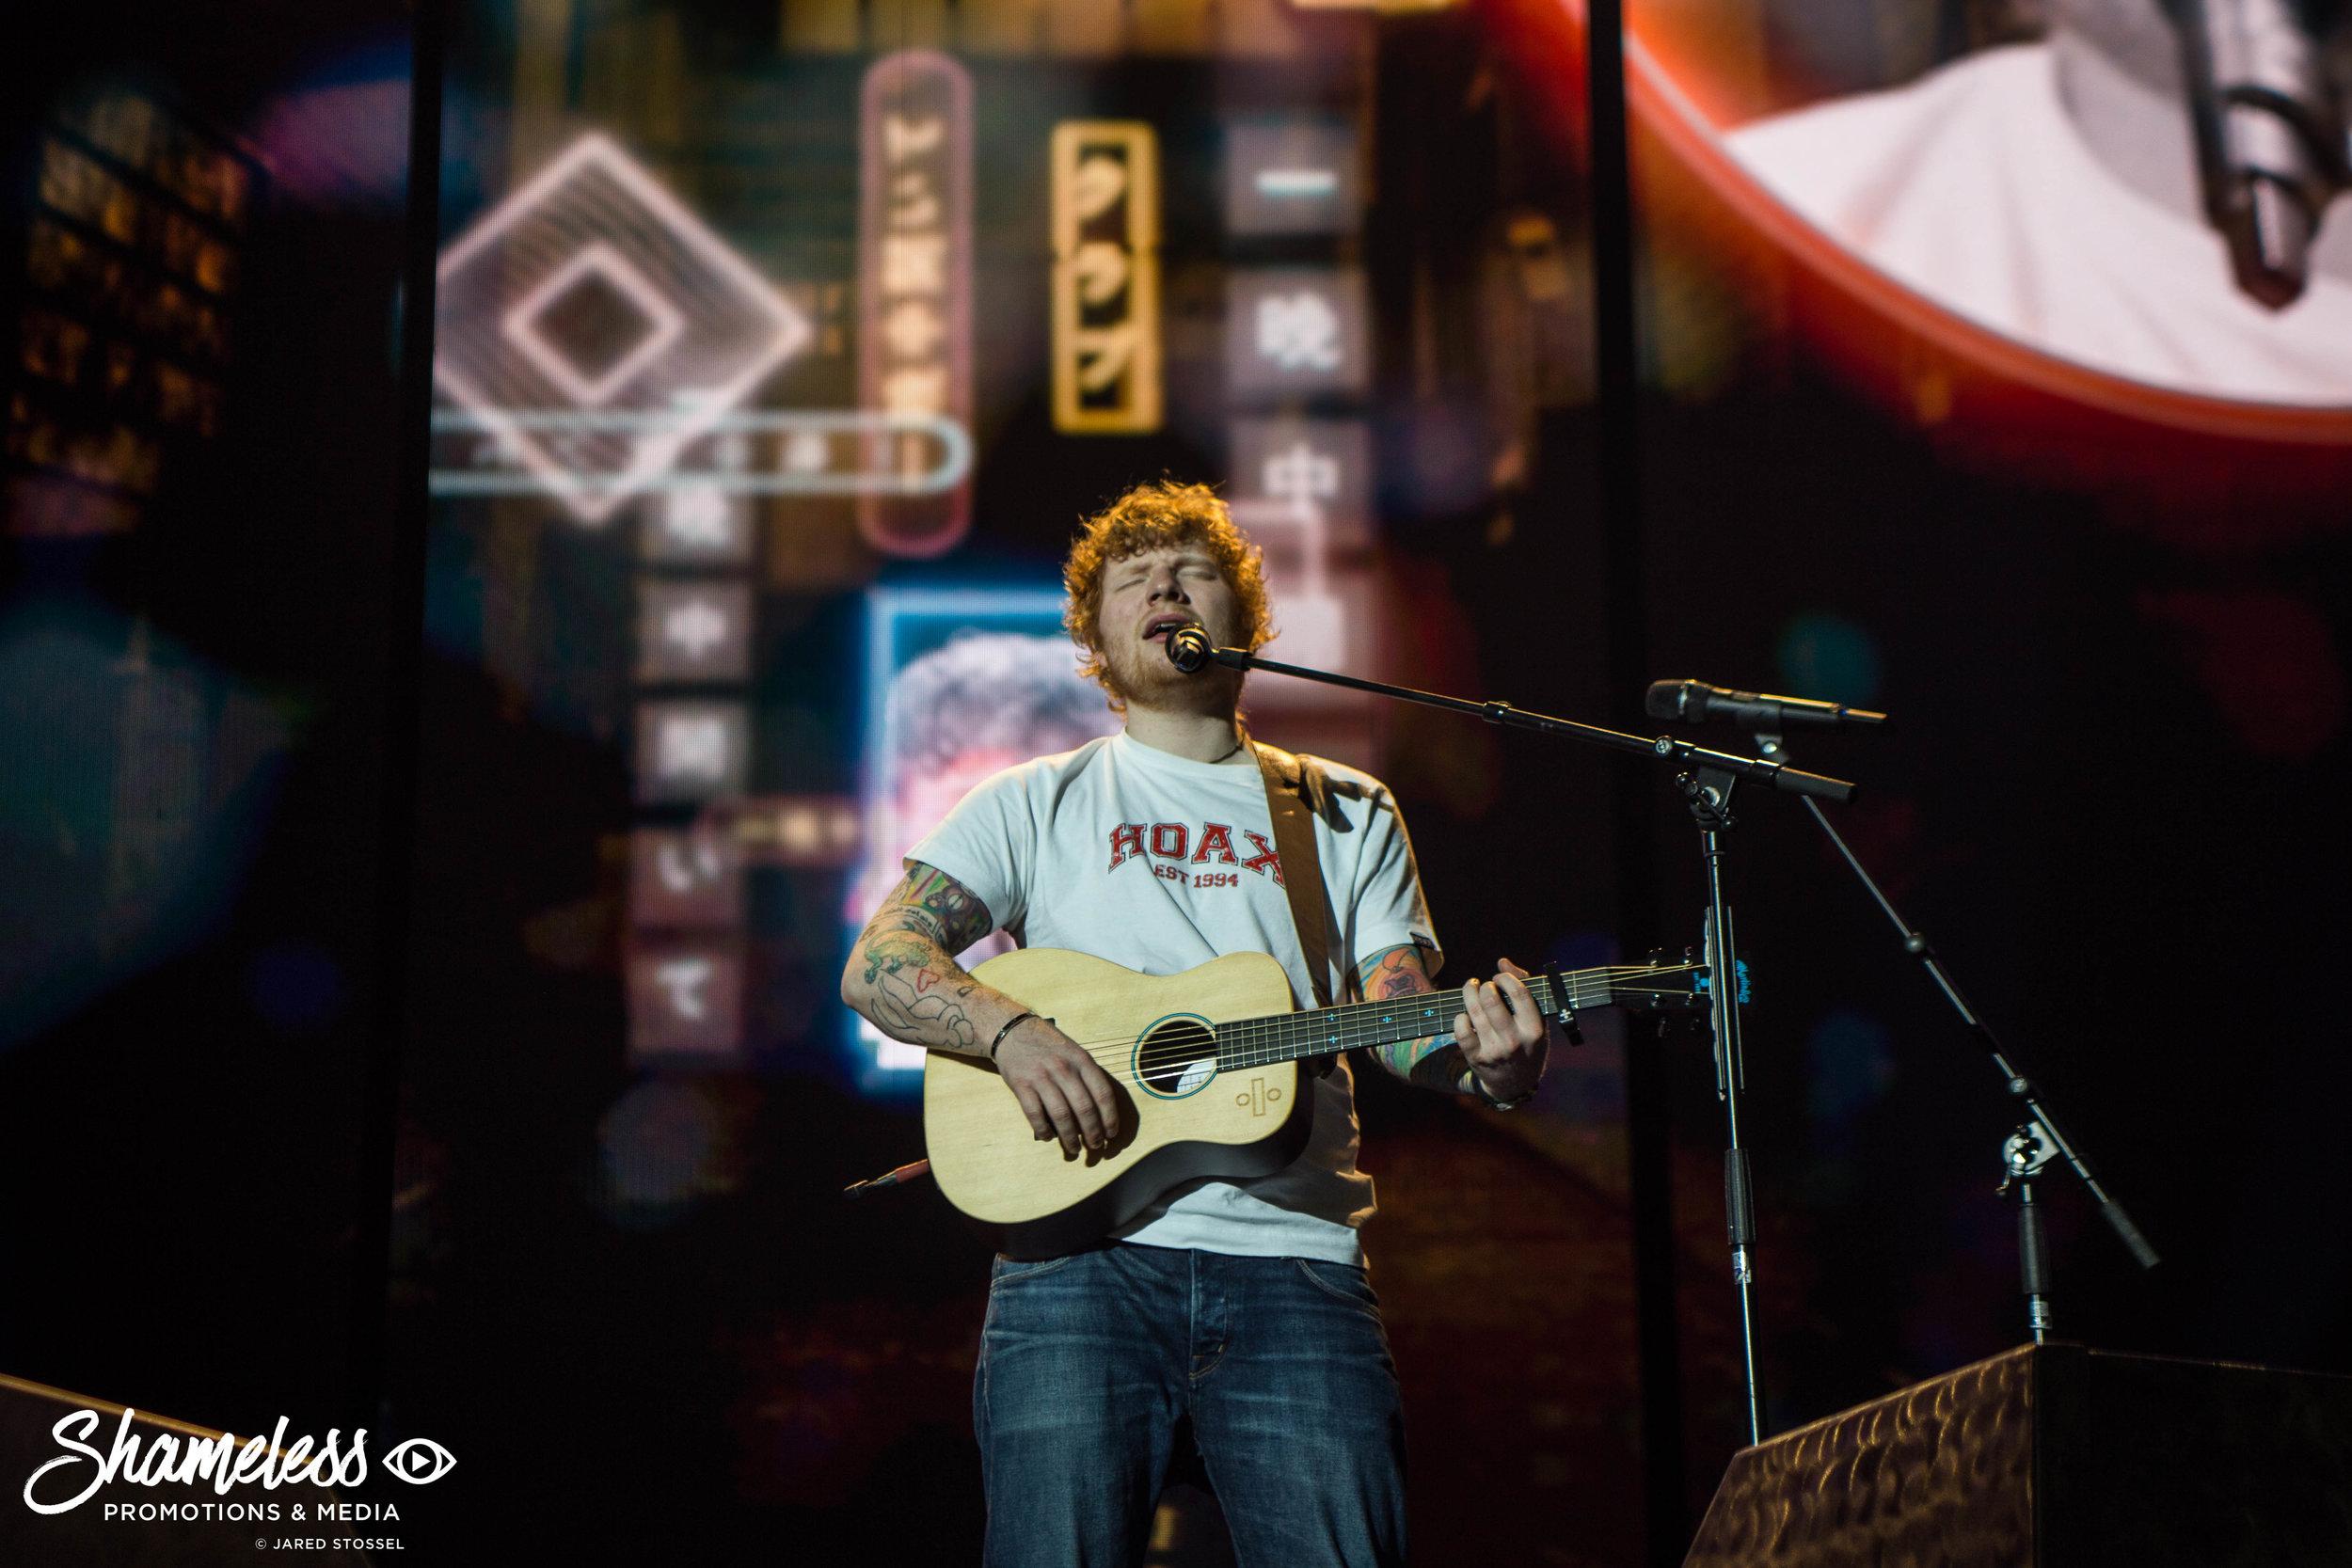 Ed Sheeran @ Oracle Arena: August 2017